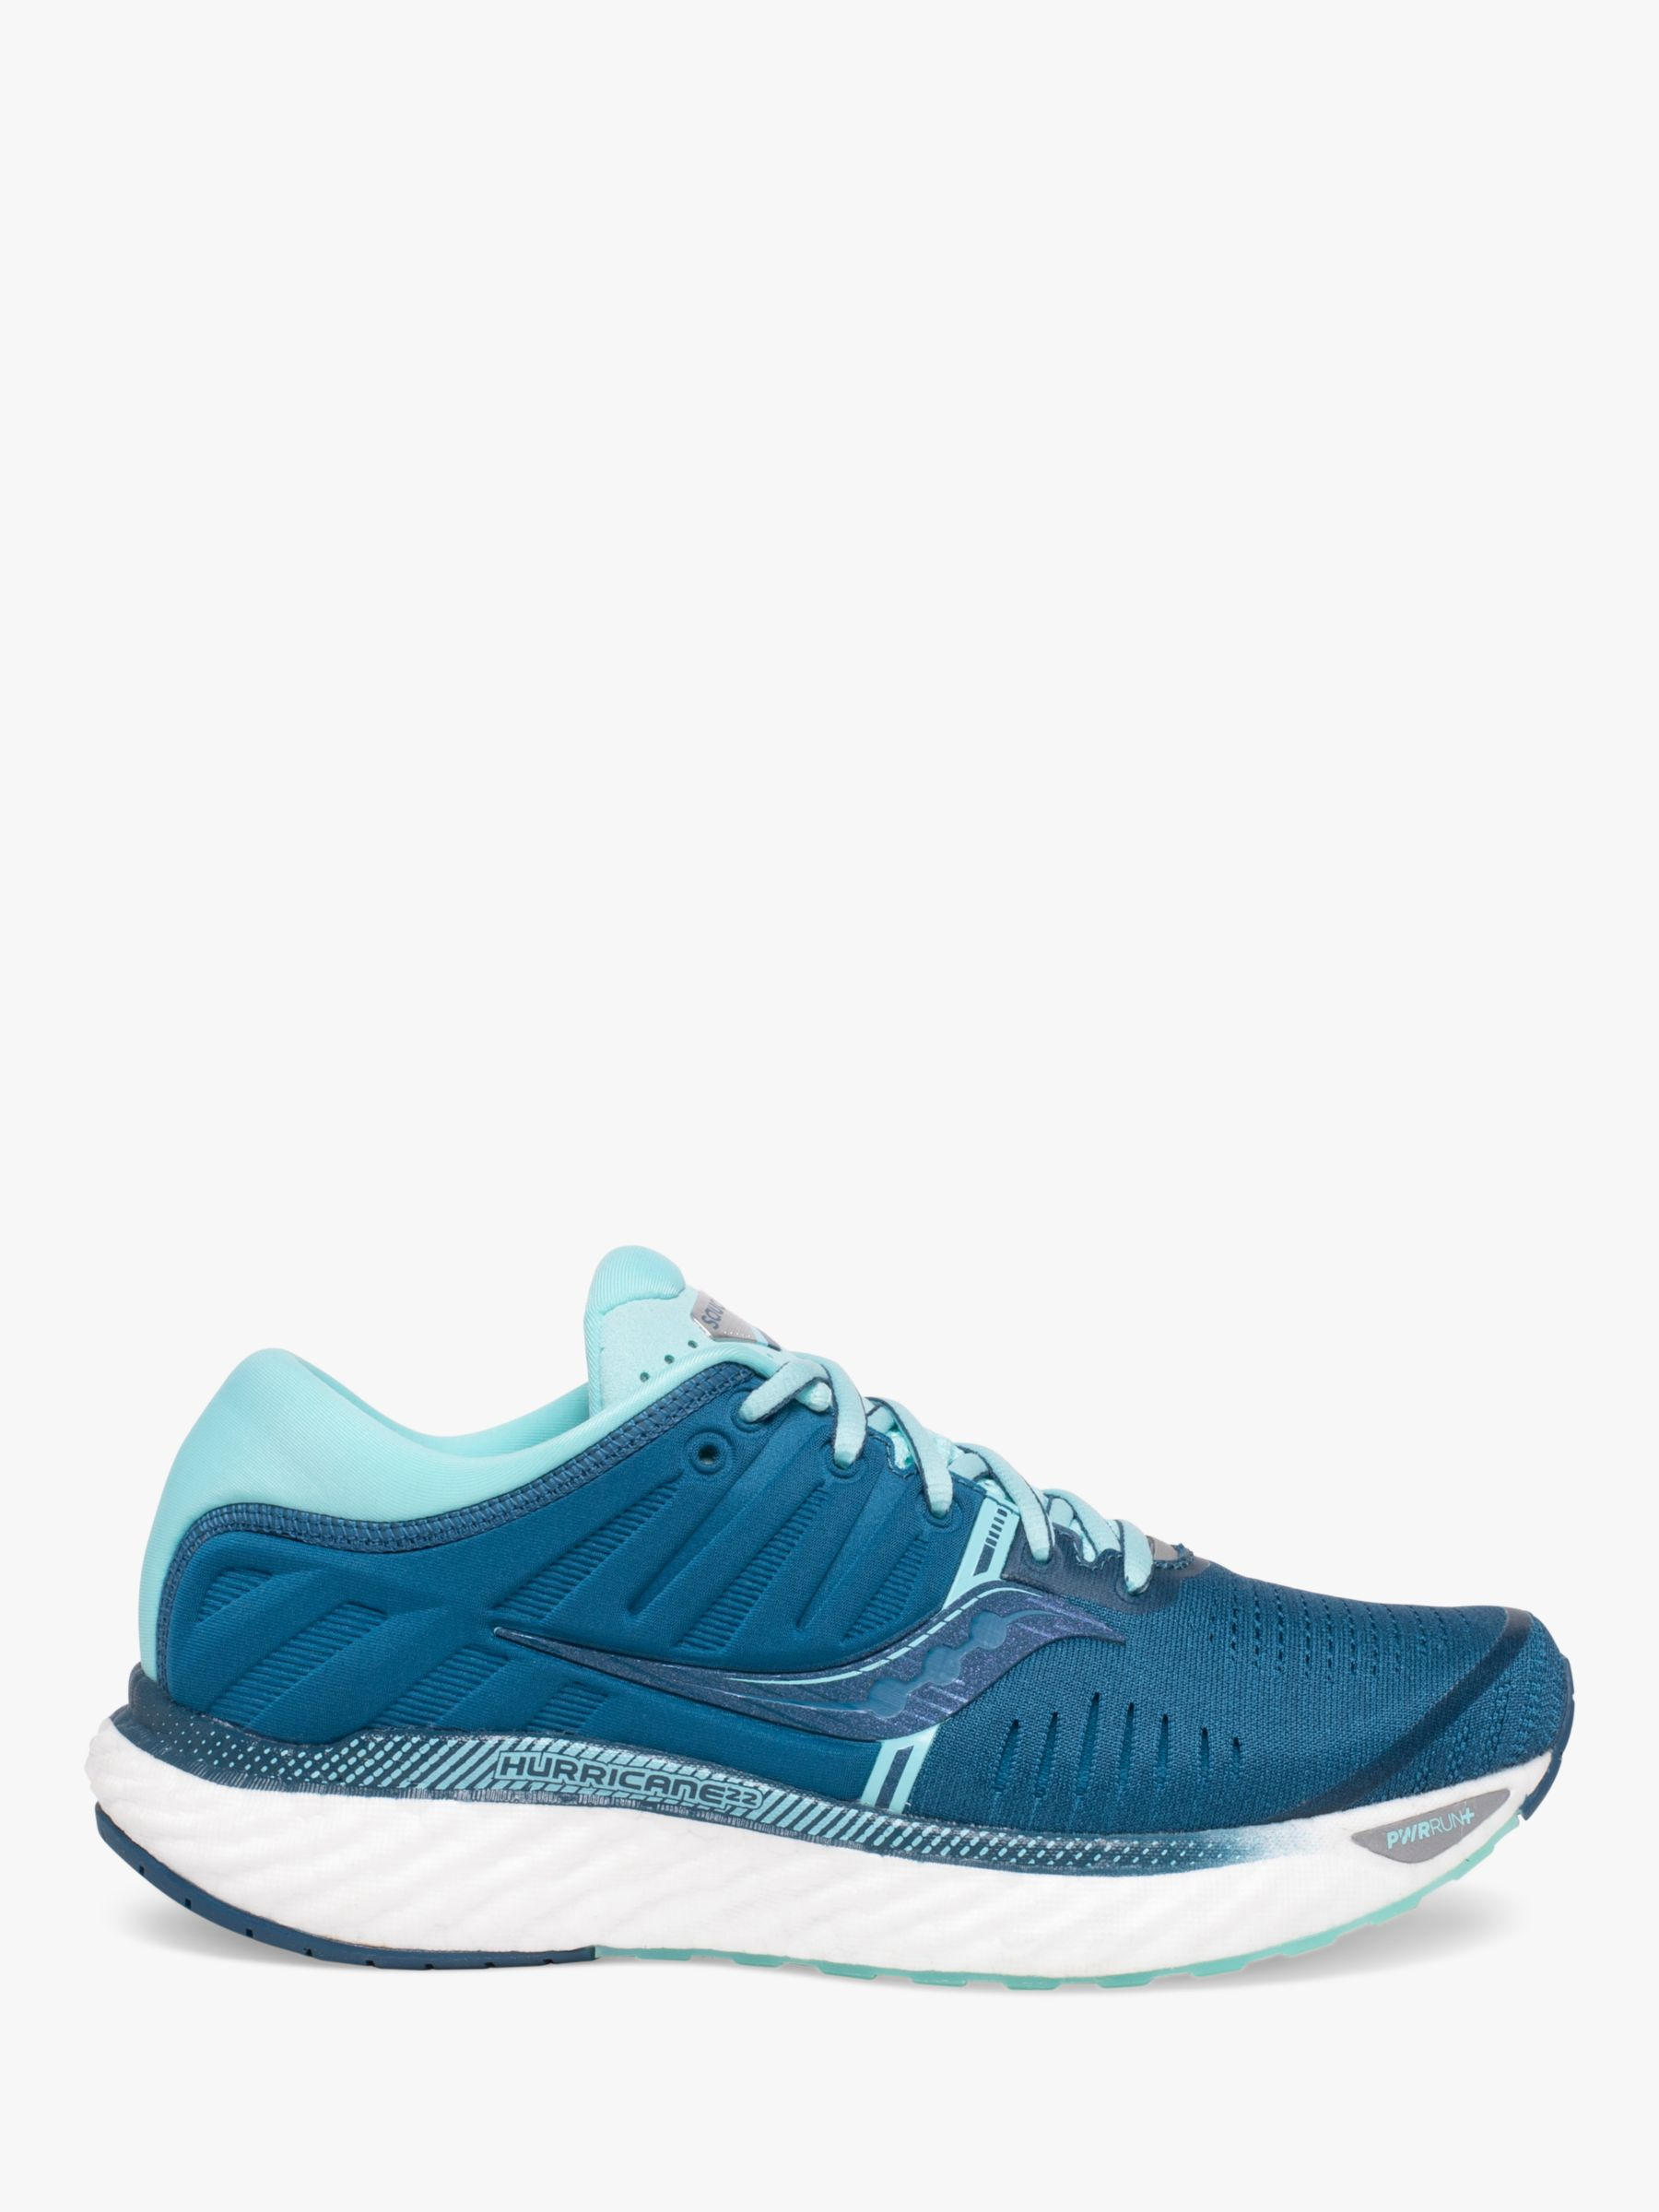 Saucony Saucony Hurricane 22 Women's Running Shoes, Blue/Aqua